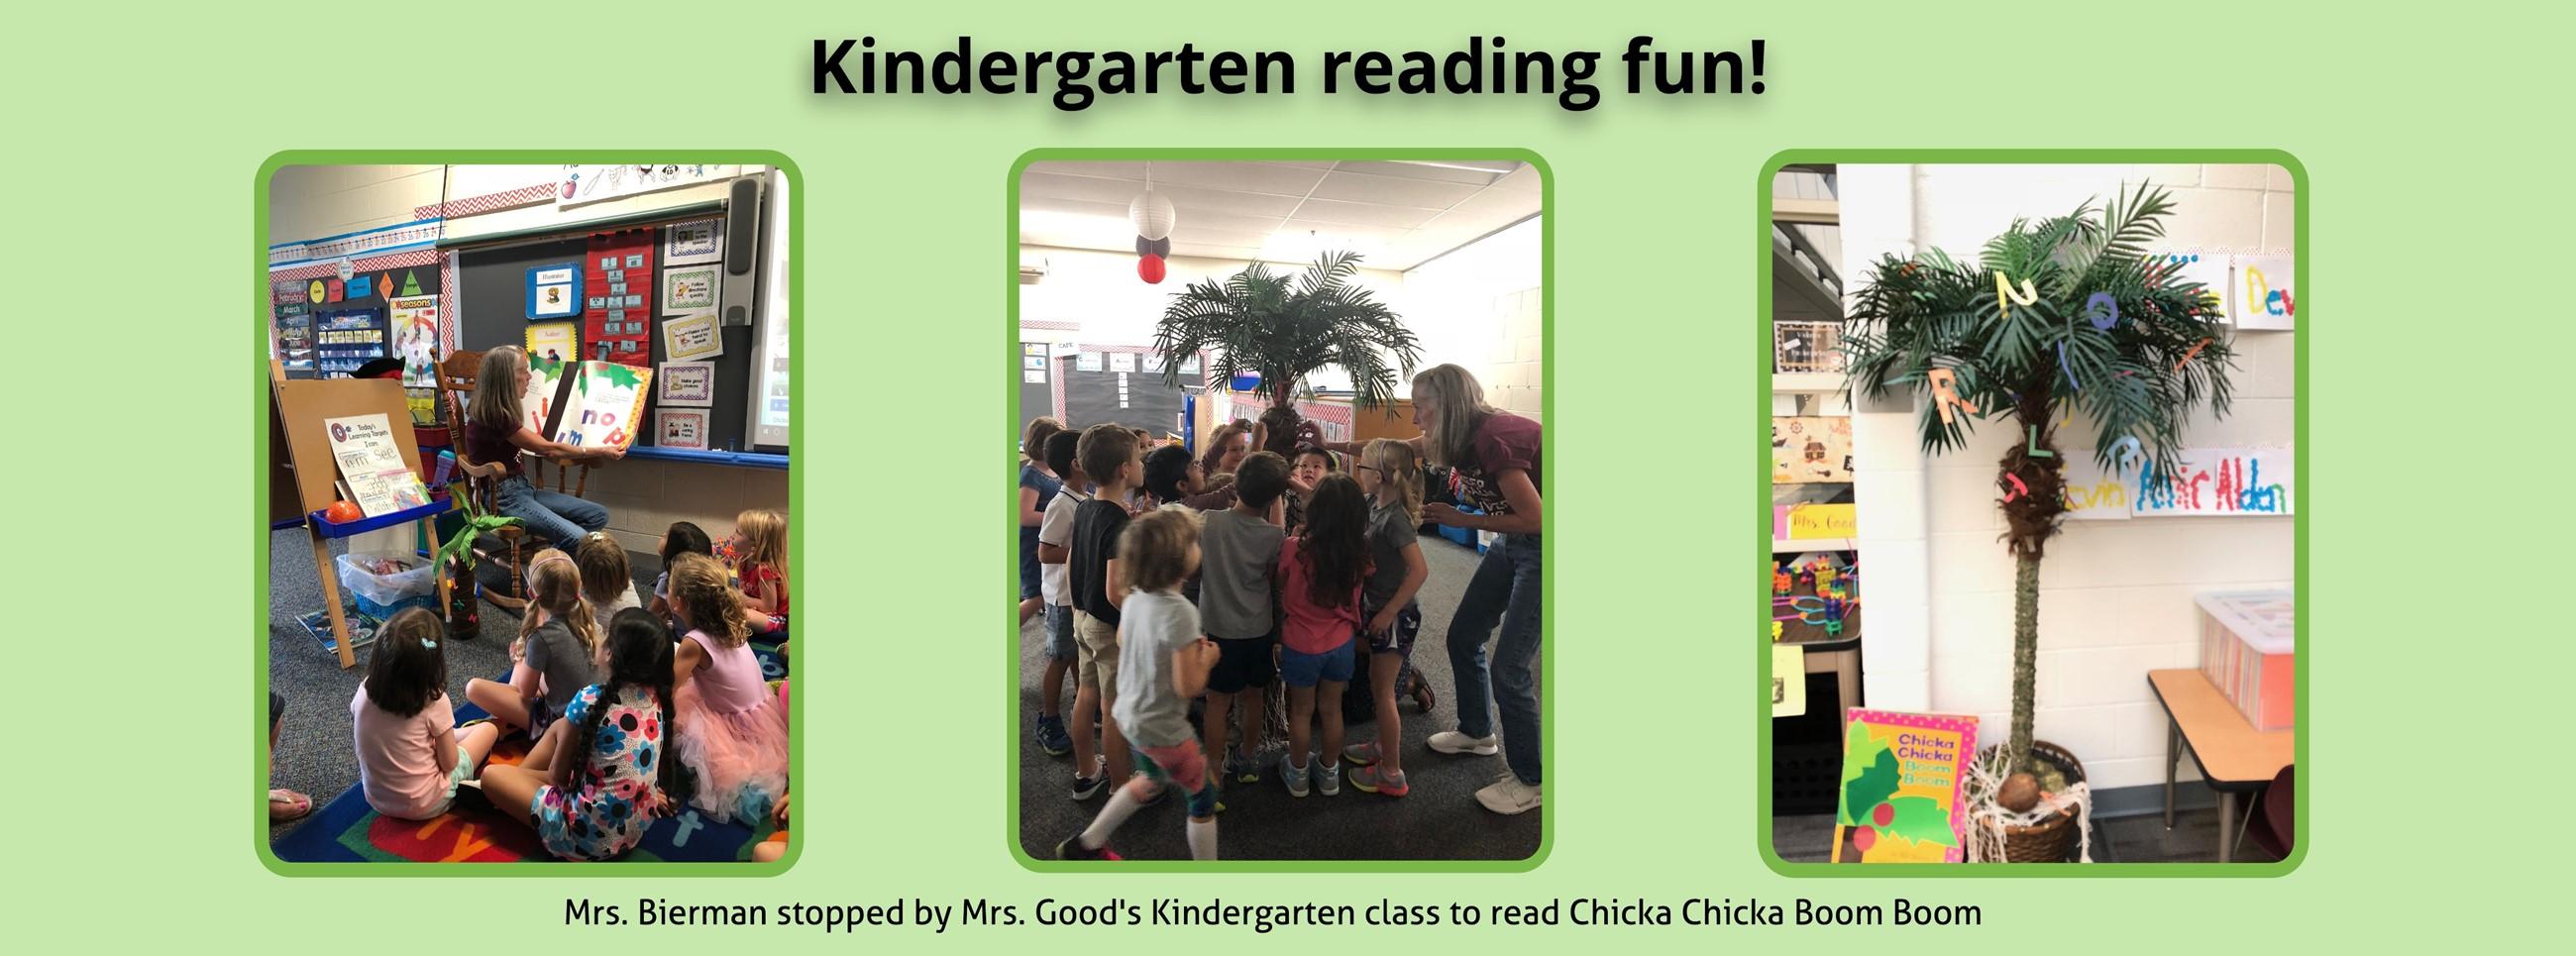 Kindergarten reading fun with Mrs. Bierman